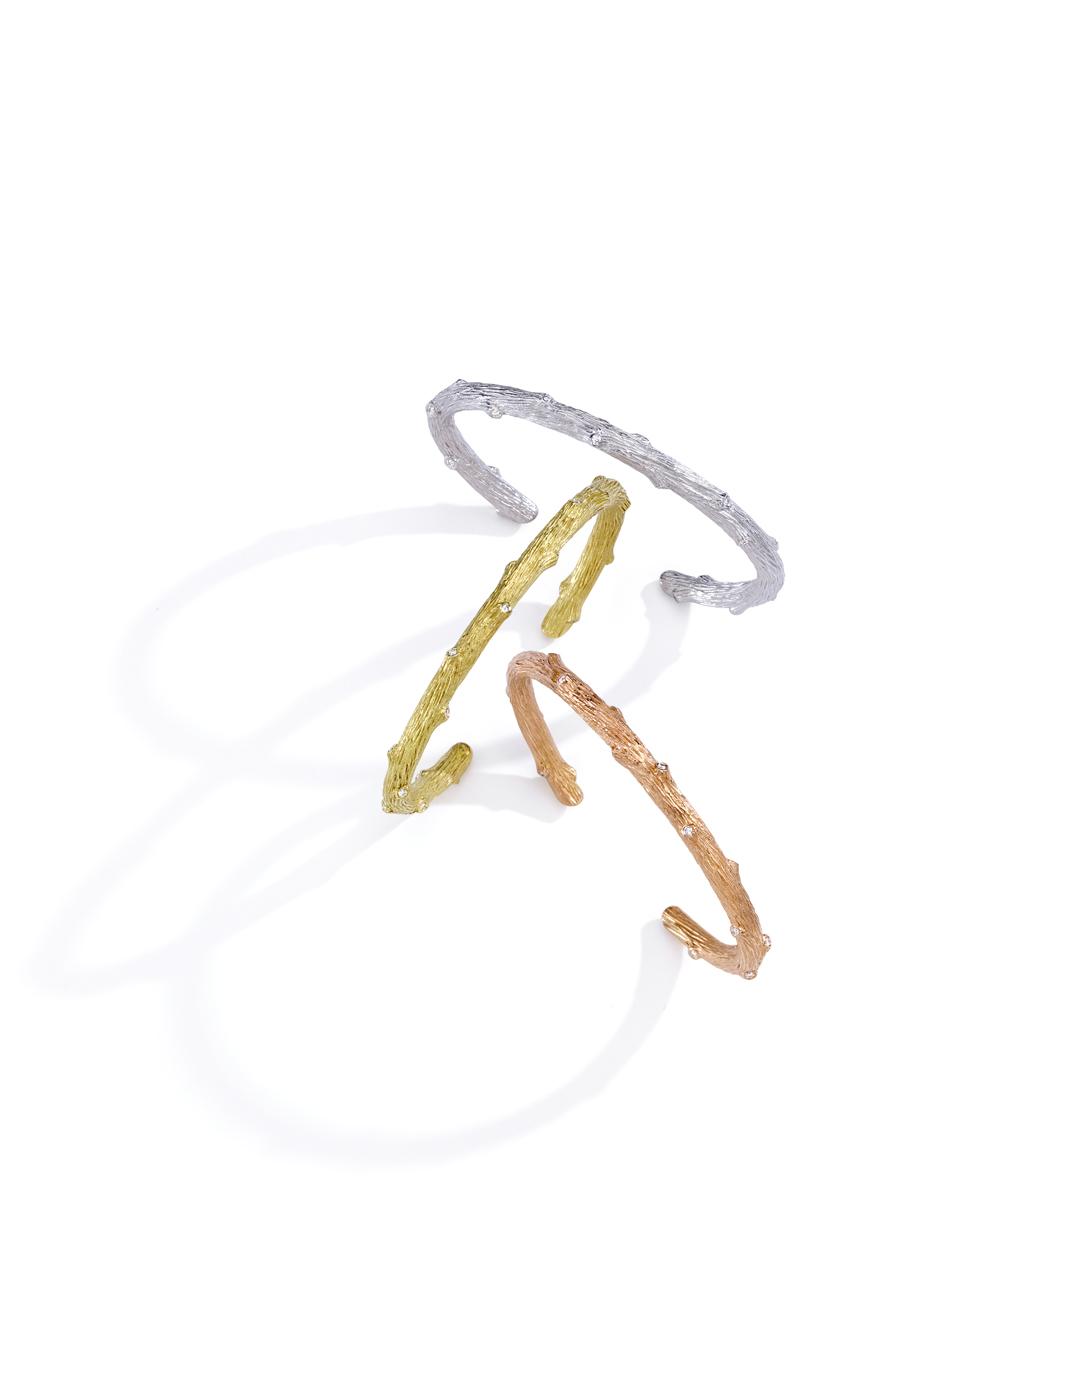 mish_jewelry_product_Twig-RG-Bangle-3